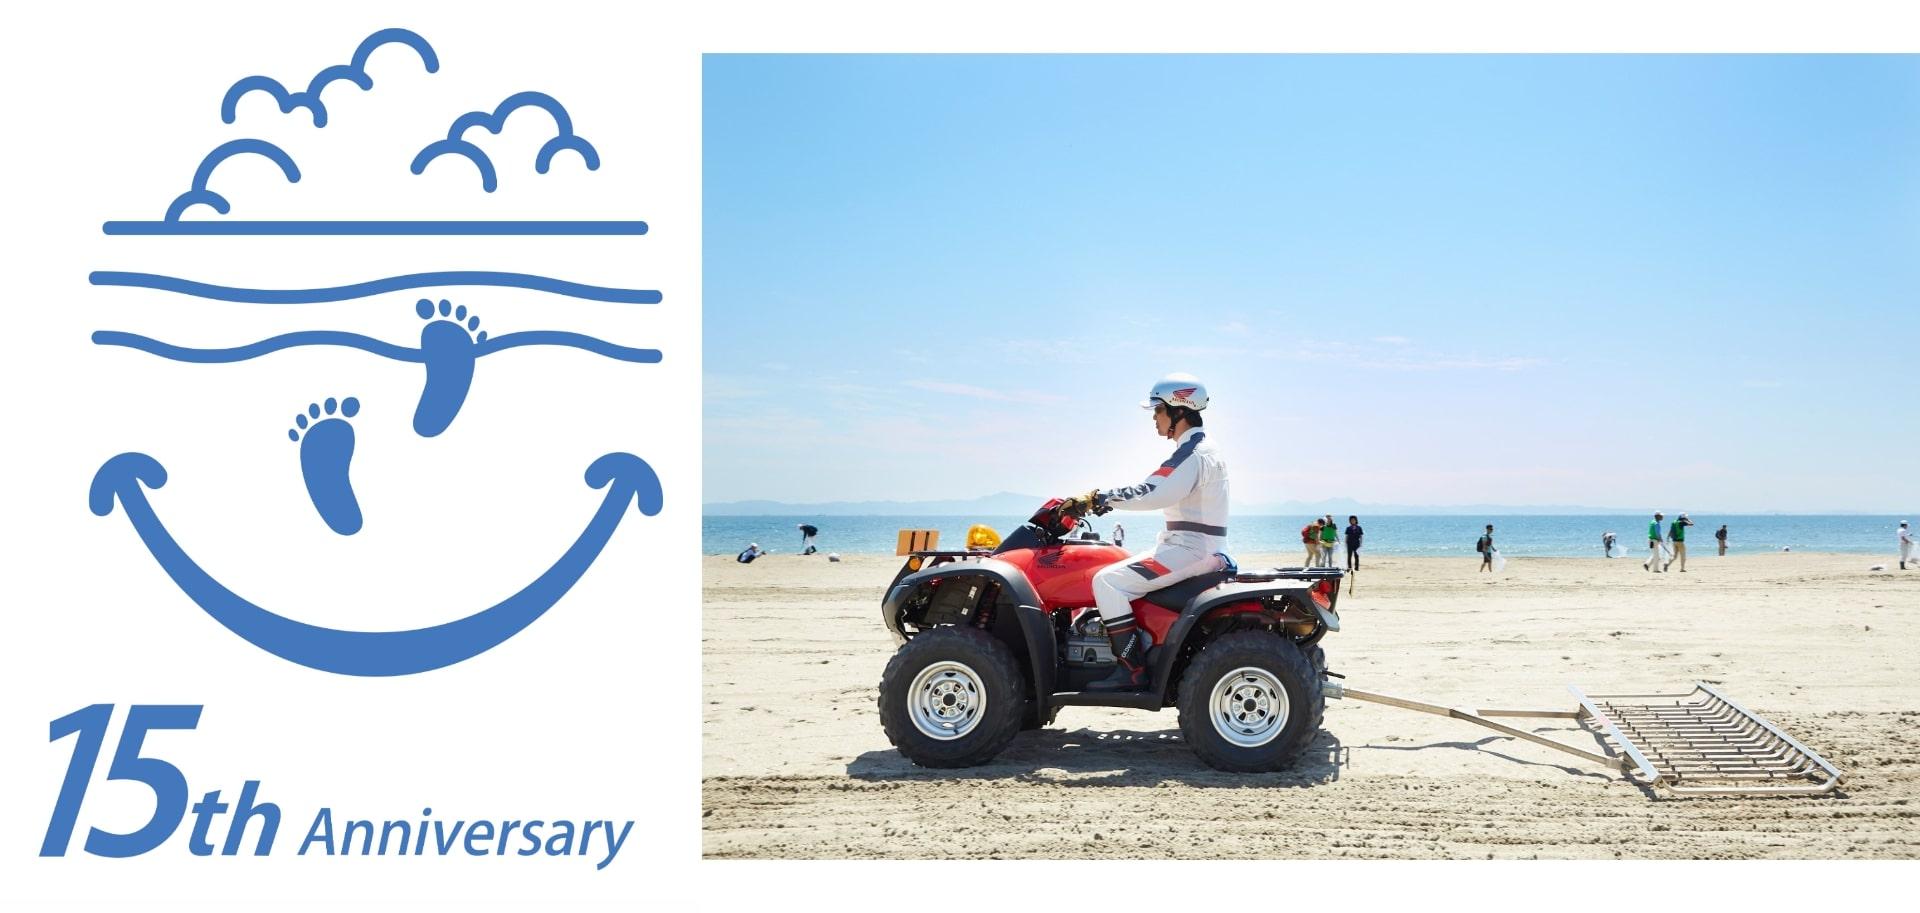 「Hondaビーチクリーン活動」15周年ロゴ(画像左)、ビーチクリーナーを使った清掃活動の様子